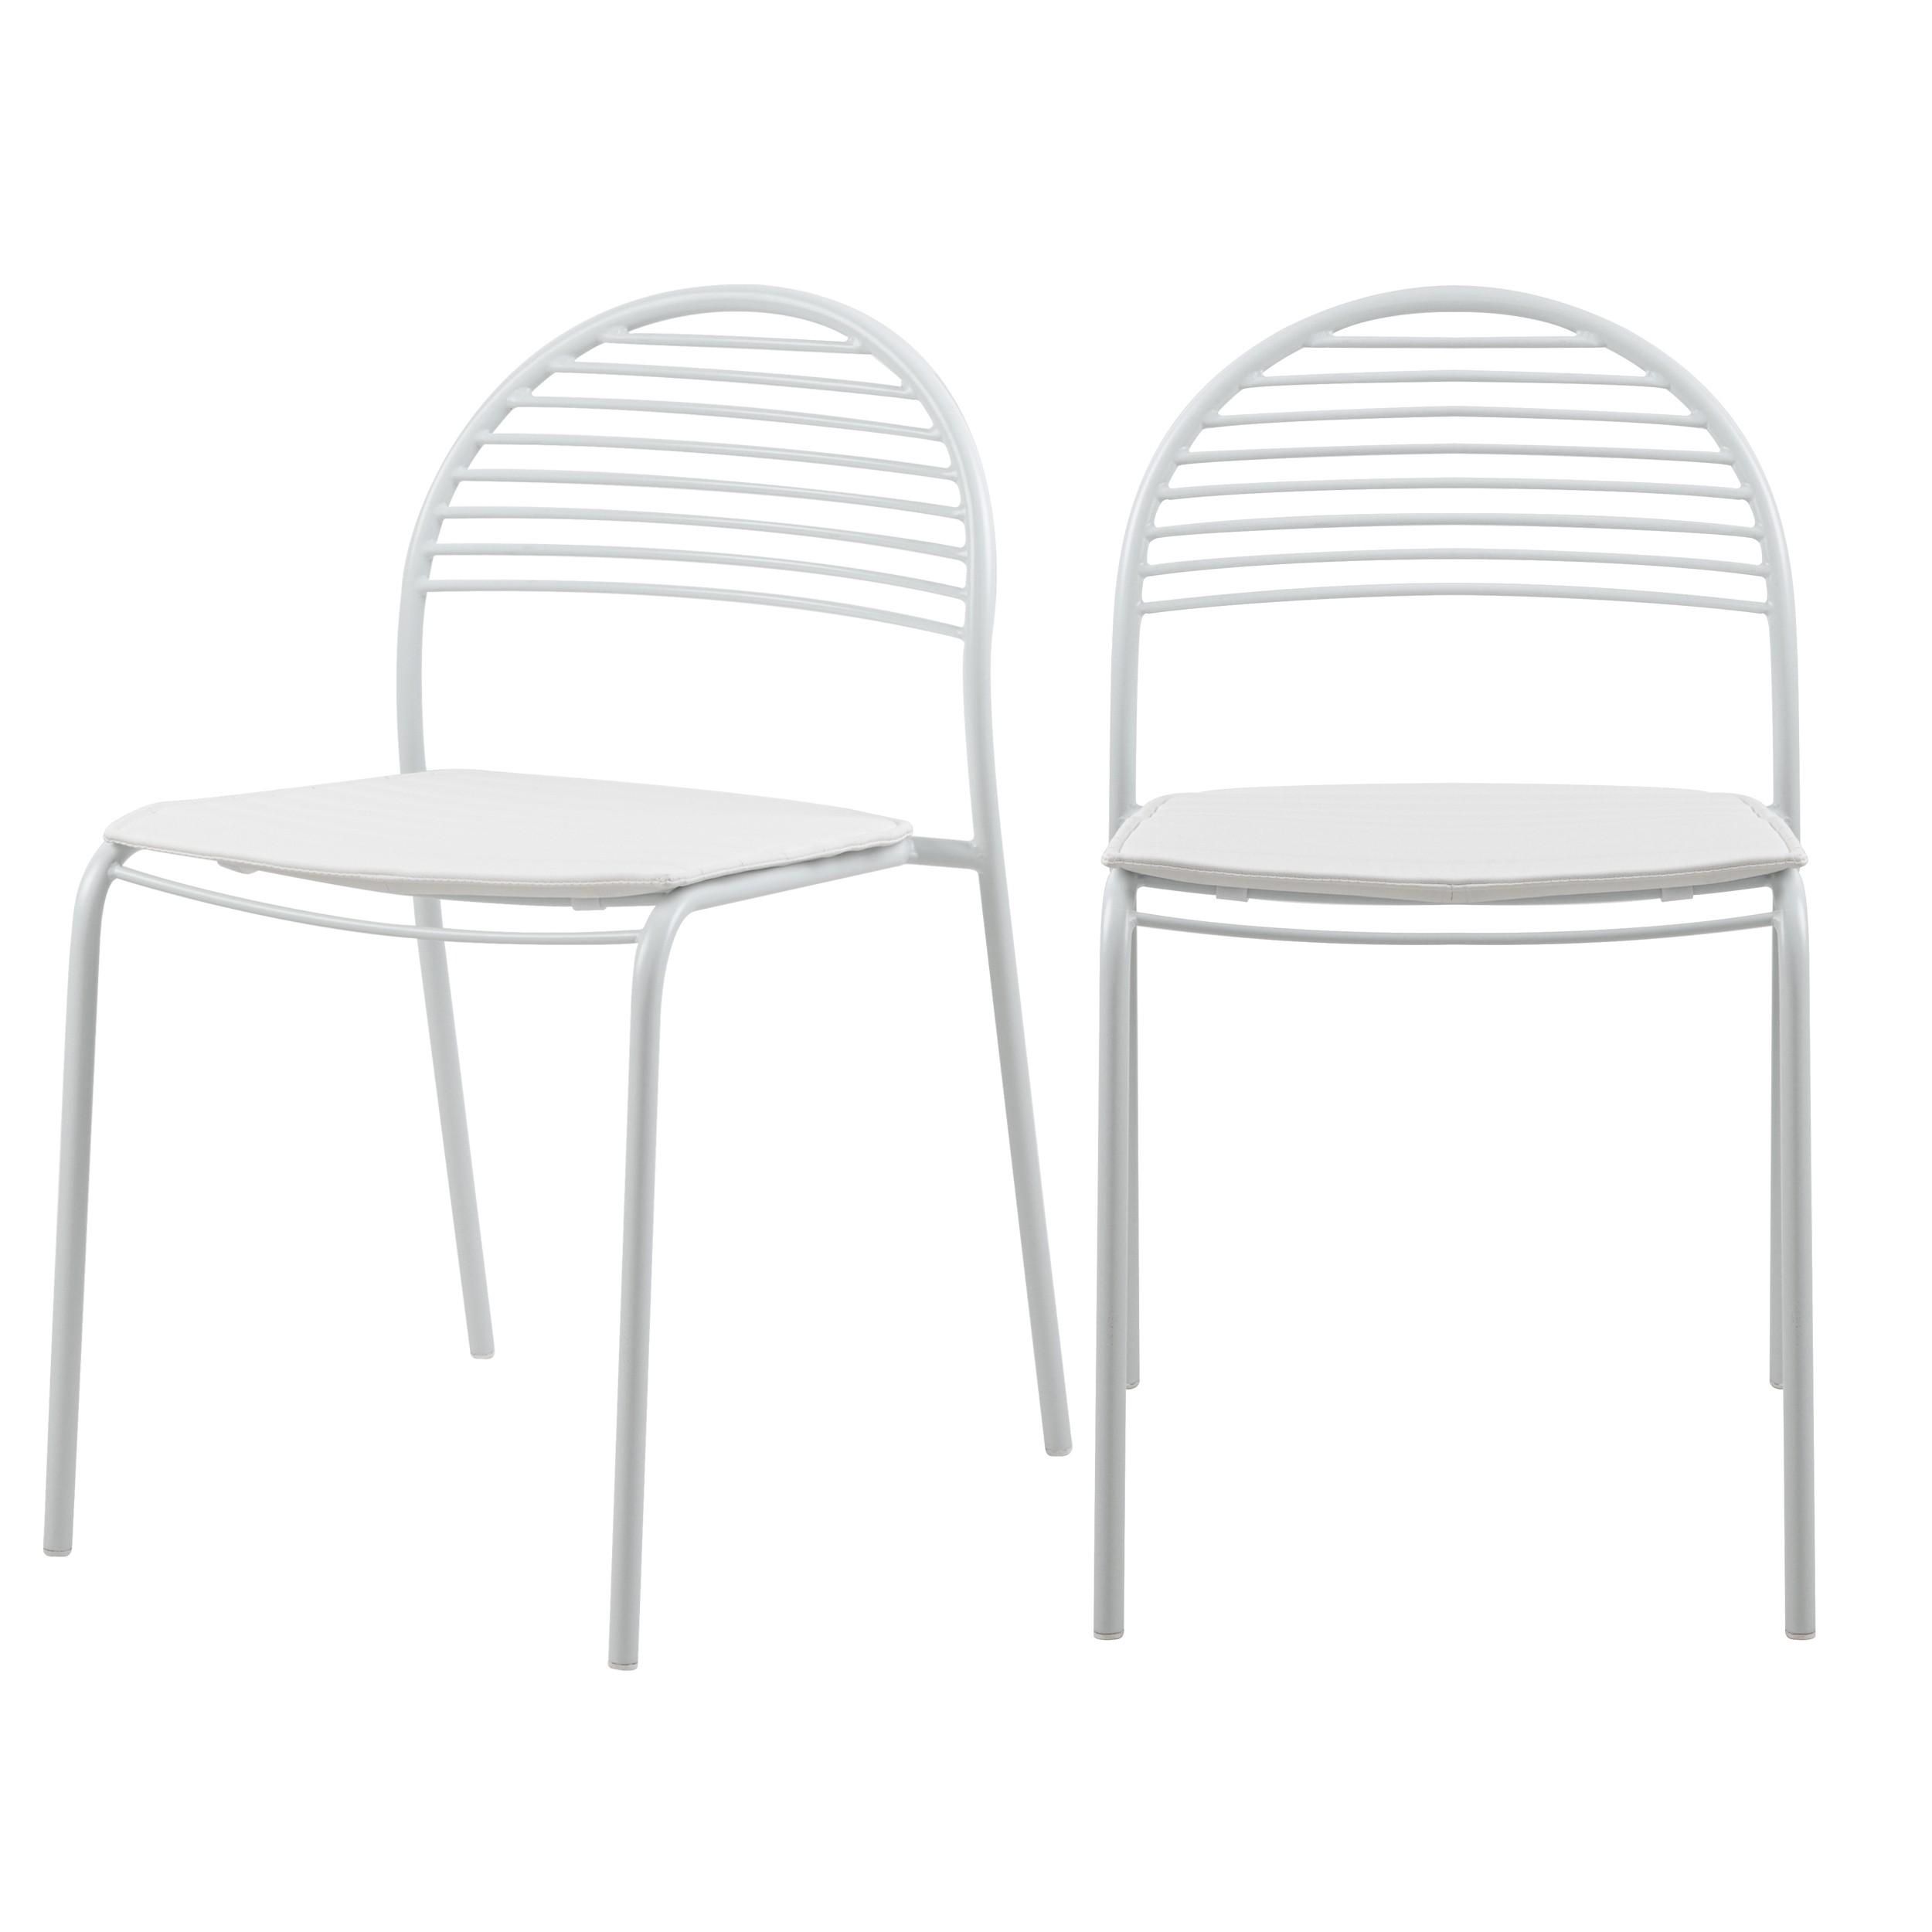 acheter chaise blanche en metal